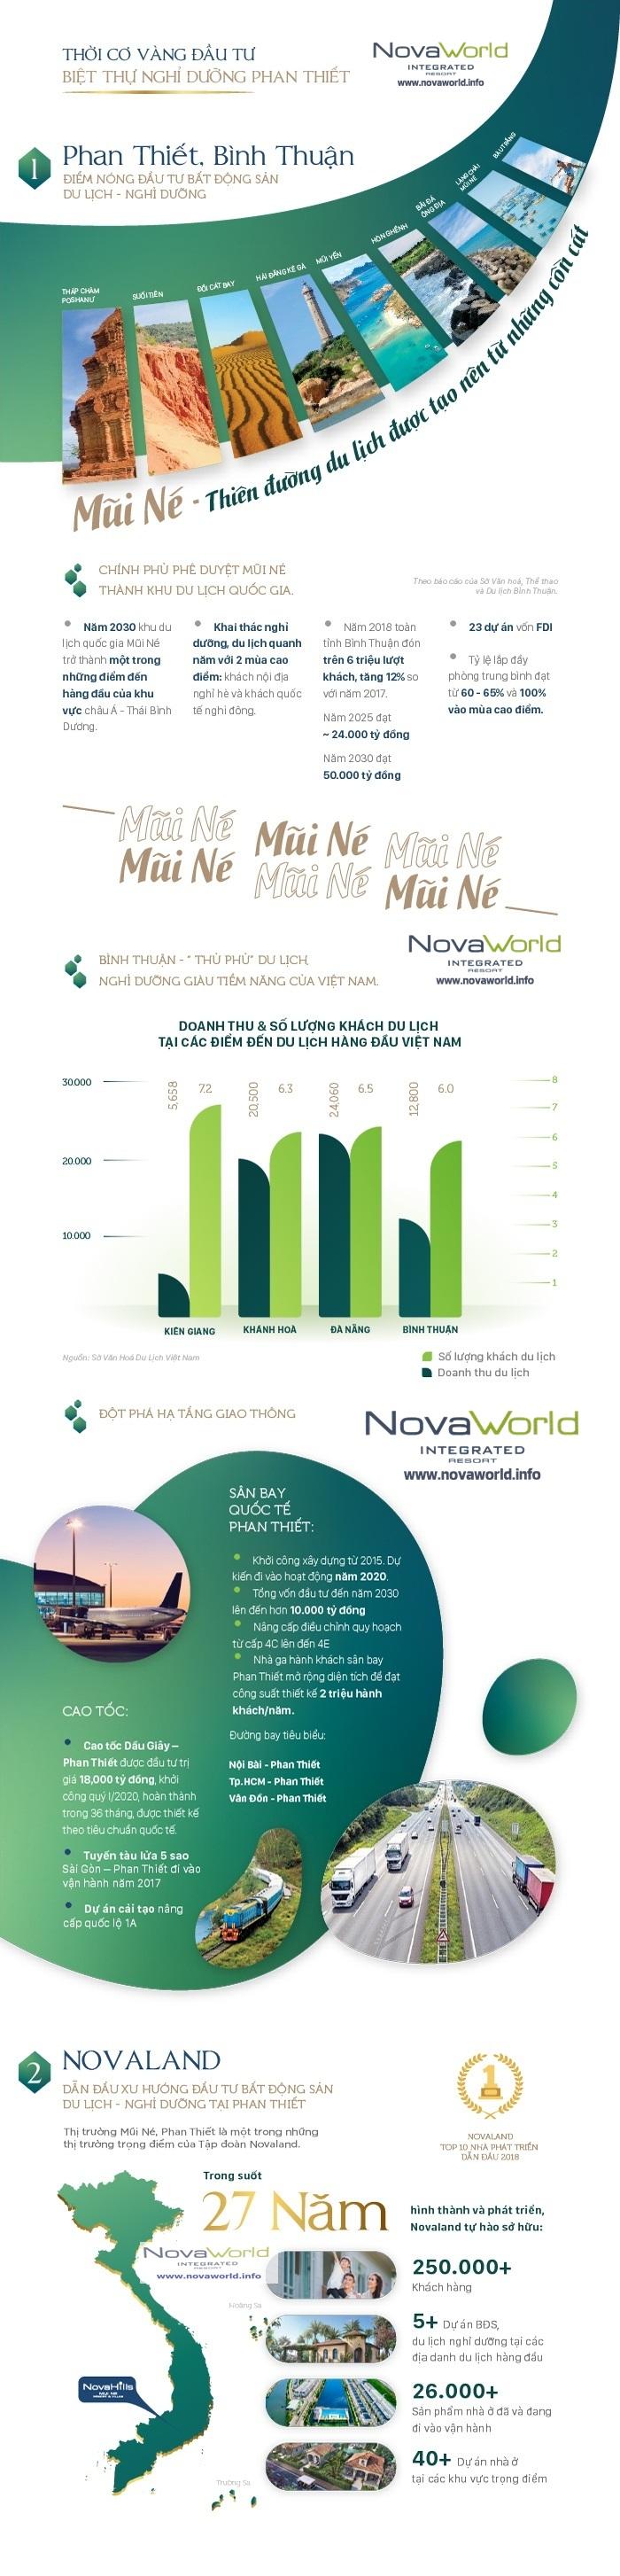 novaworld phan thiet infografic 1